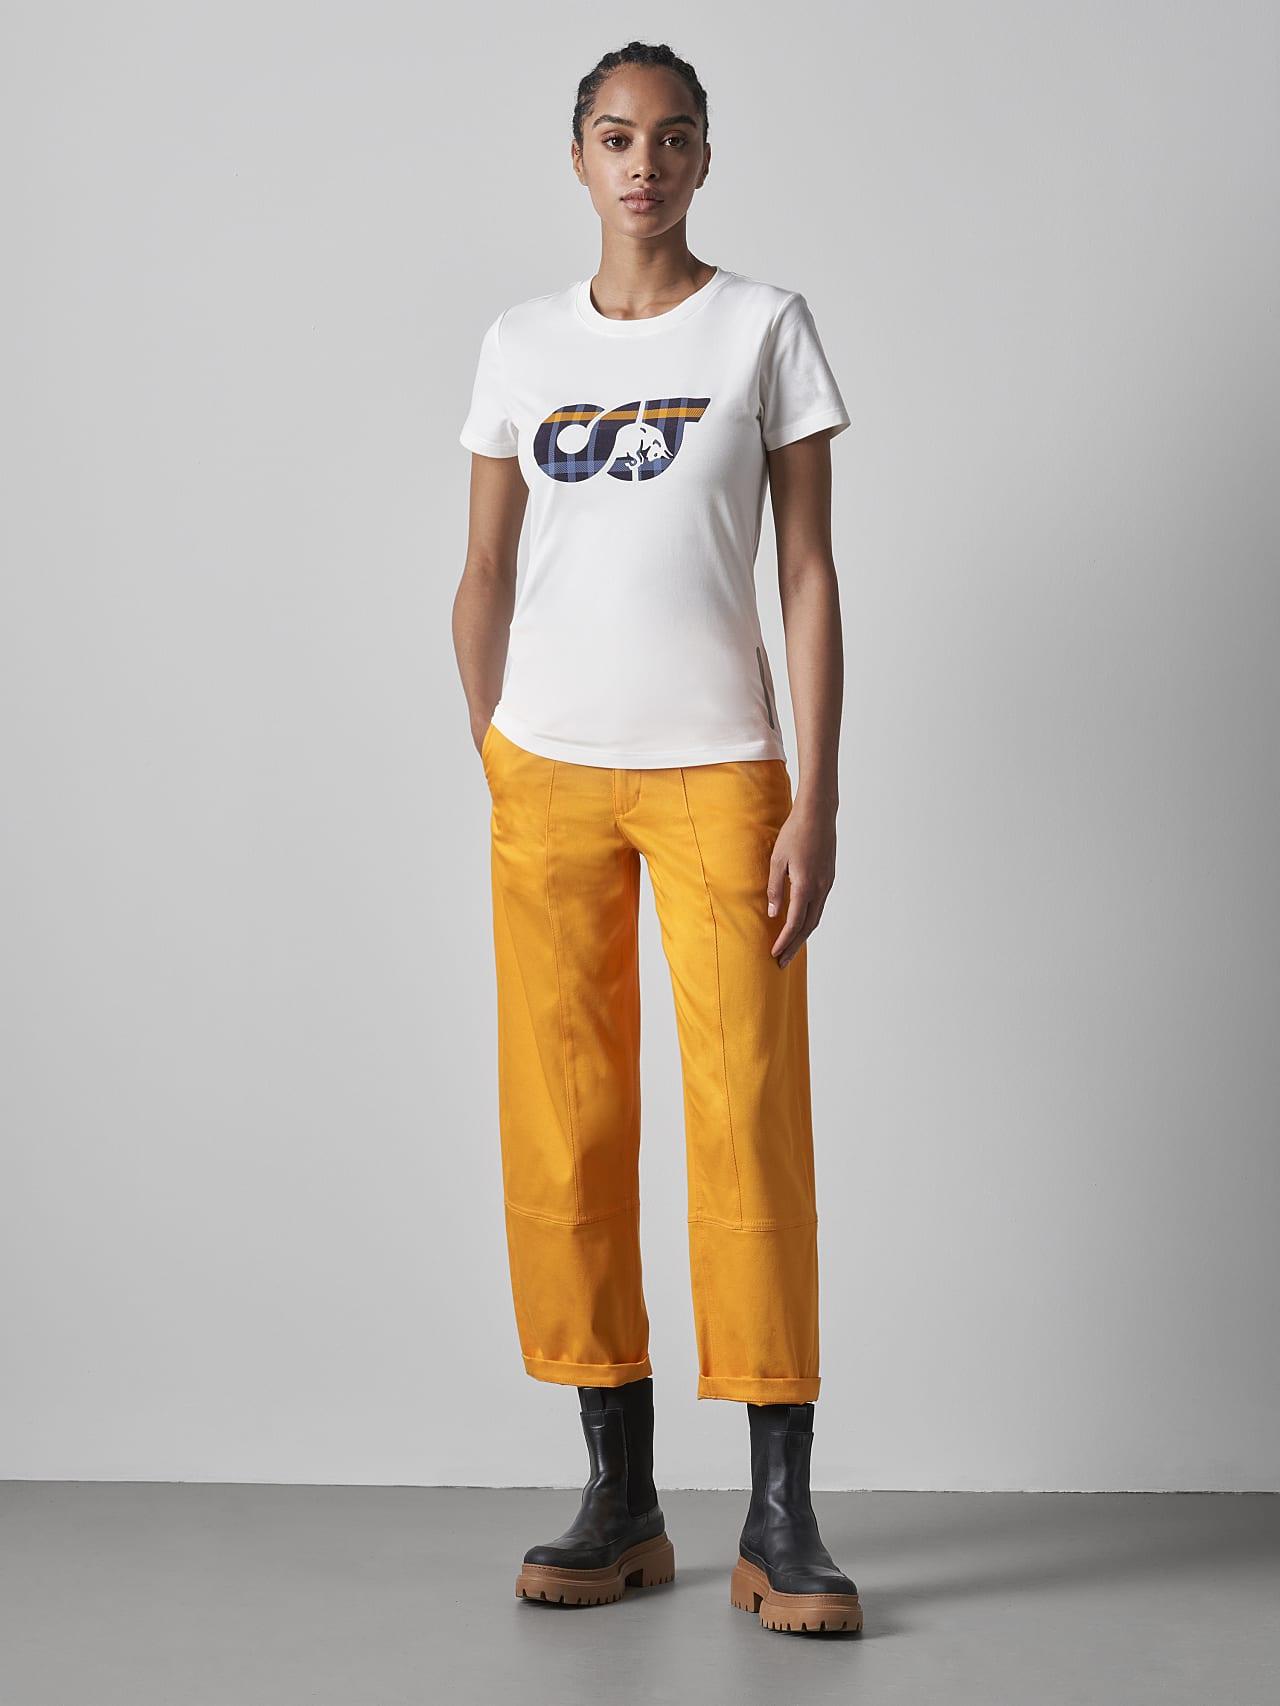 JANPA V1.Y5.02 Logo Print T-Shirt offwhite Front Alpha Tauri